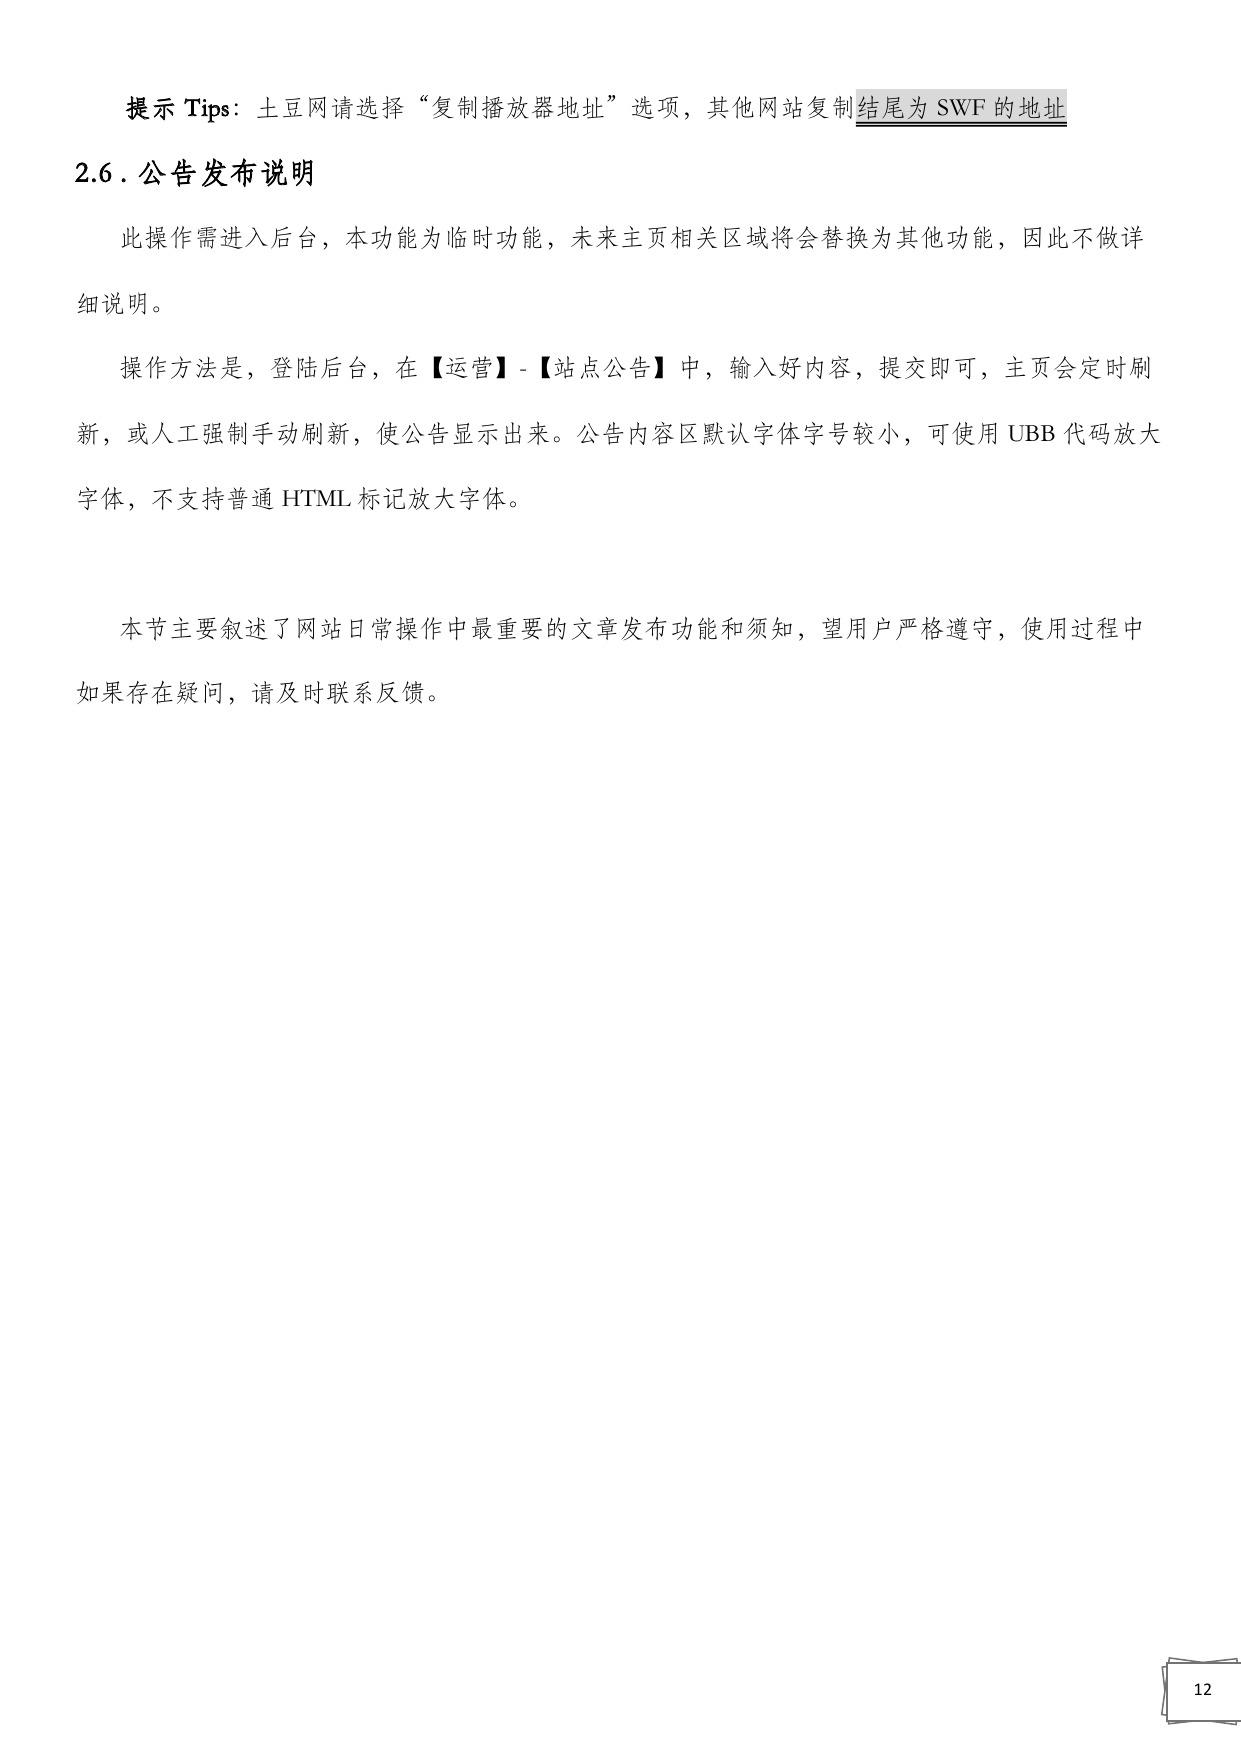 image-12.jpg